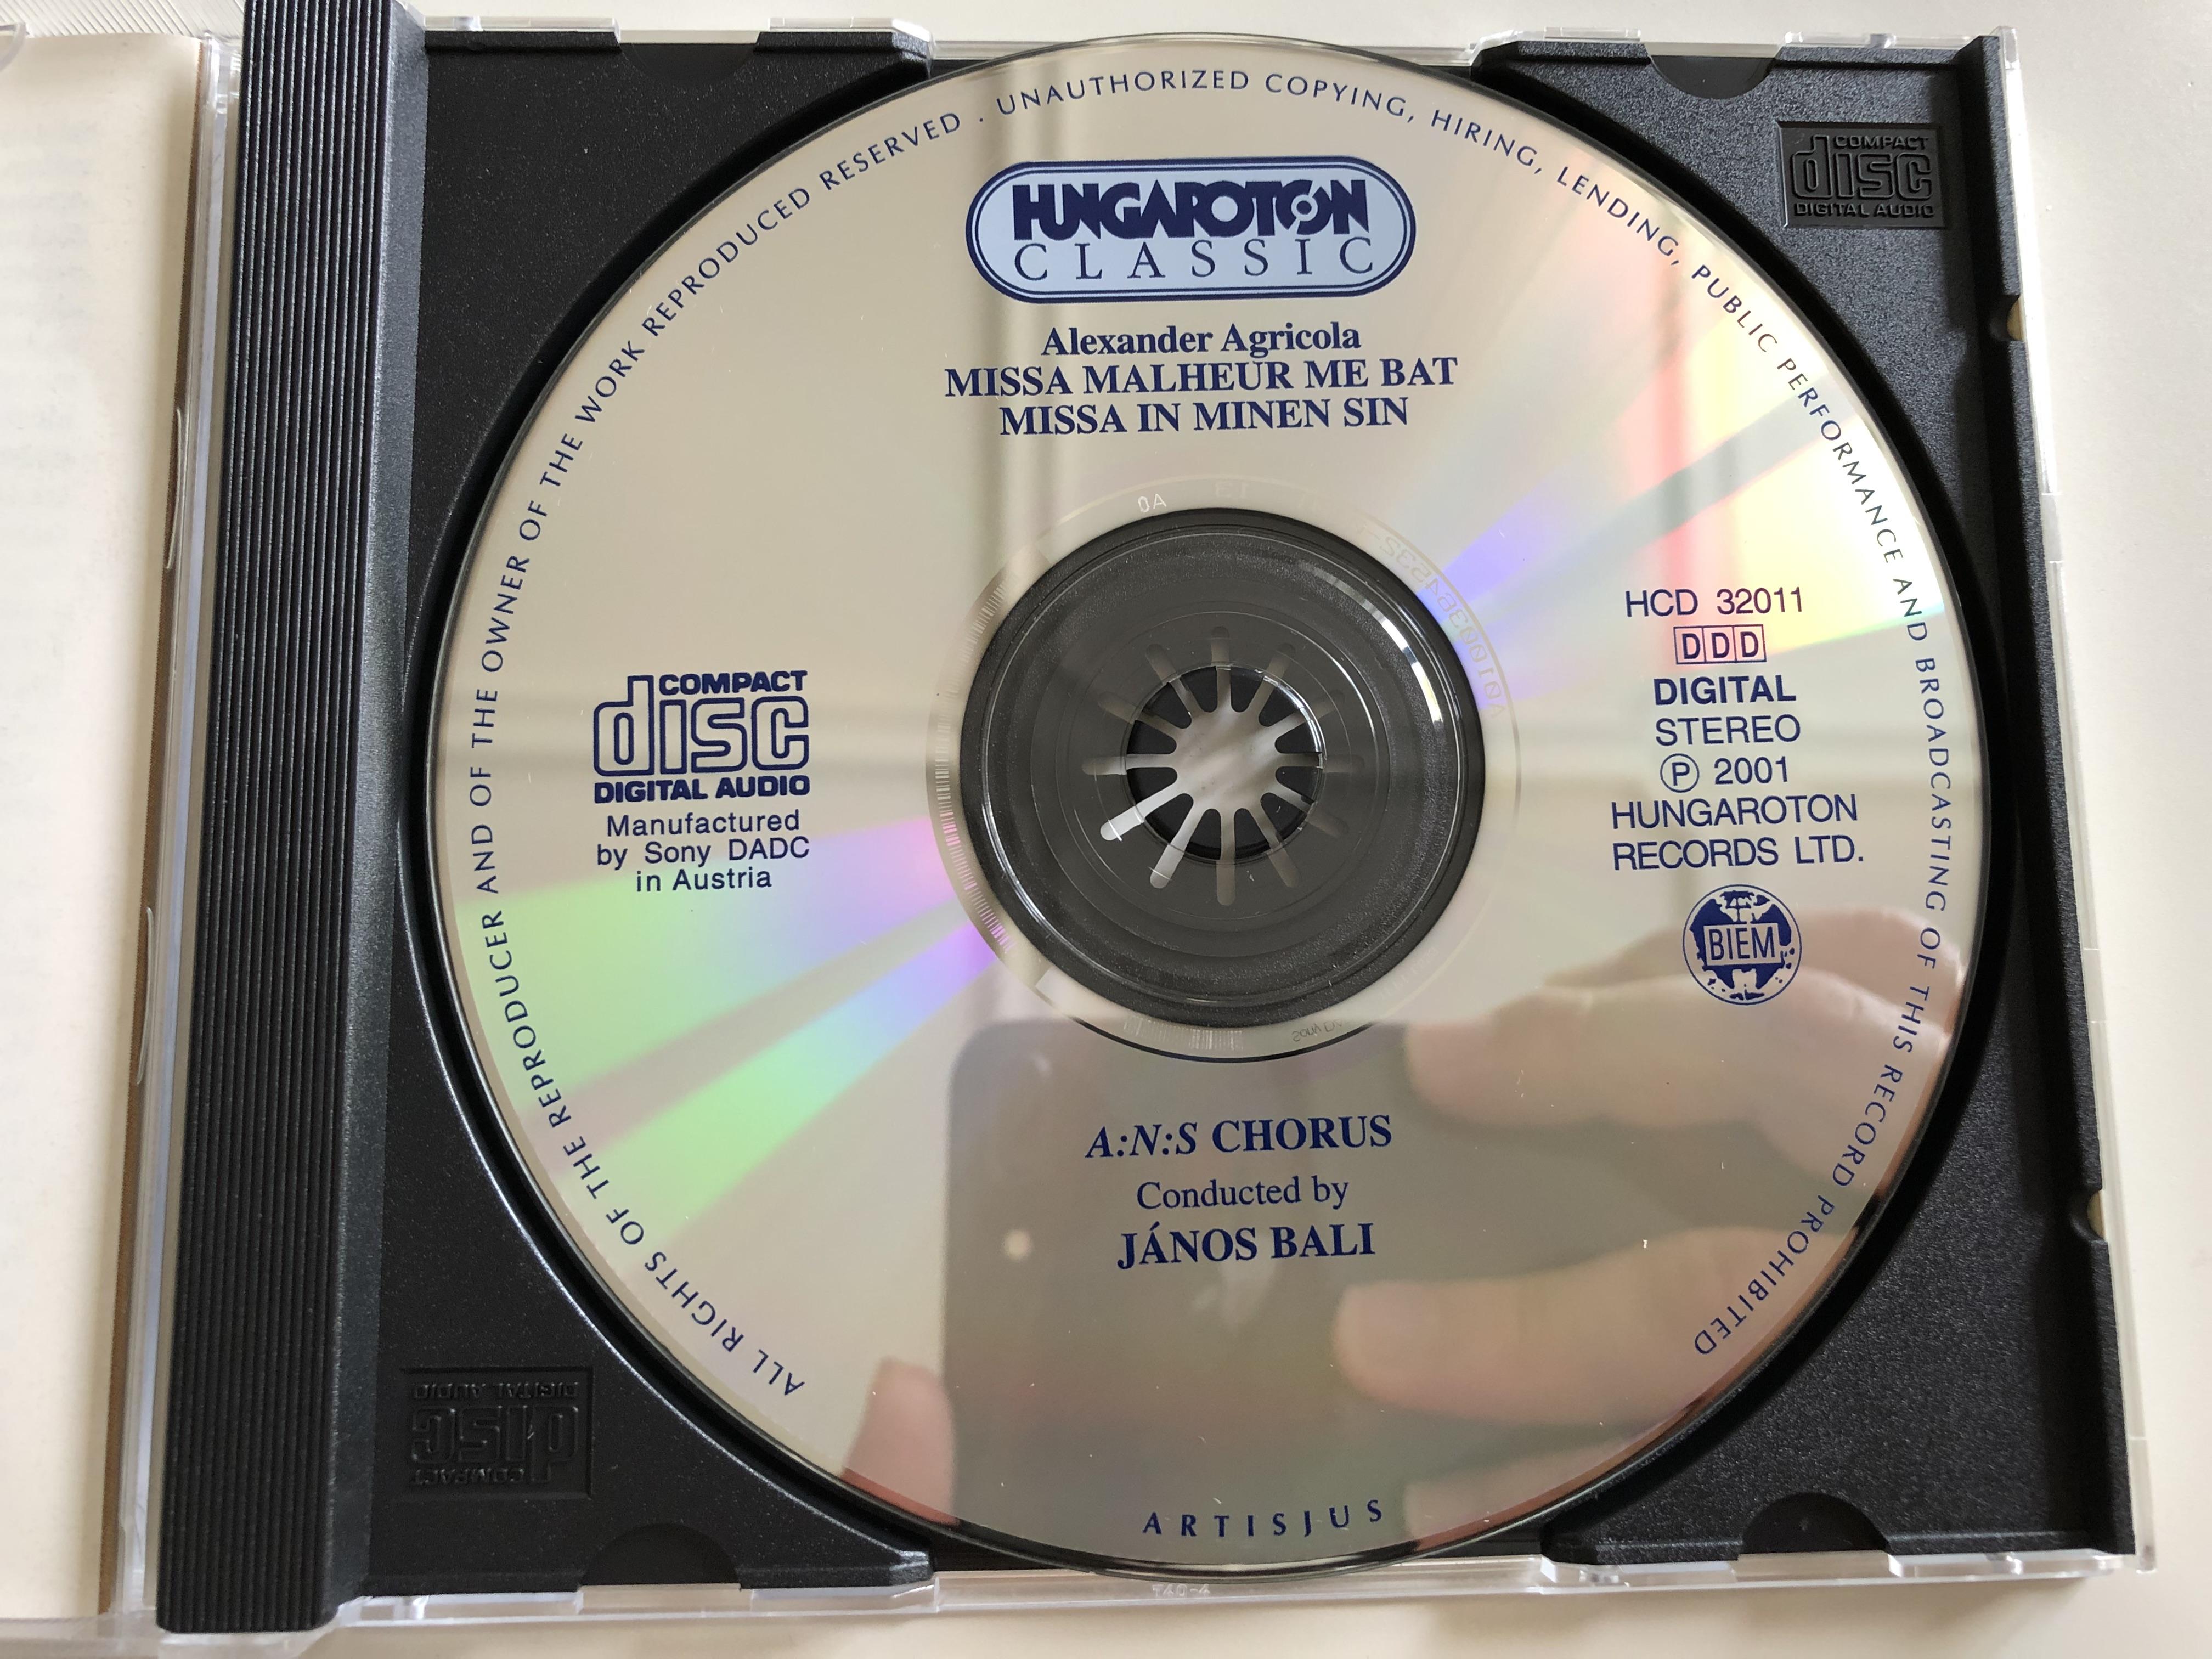 agricola-missa-malheur-me-bat-missa-in-minen-sin-ans-chorus-j-nos-bali-hungaroton-classic-audio-cd-2001-hcd-32011-6-.jpg